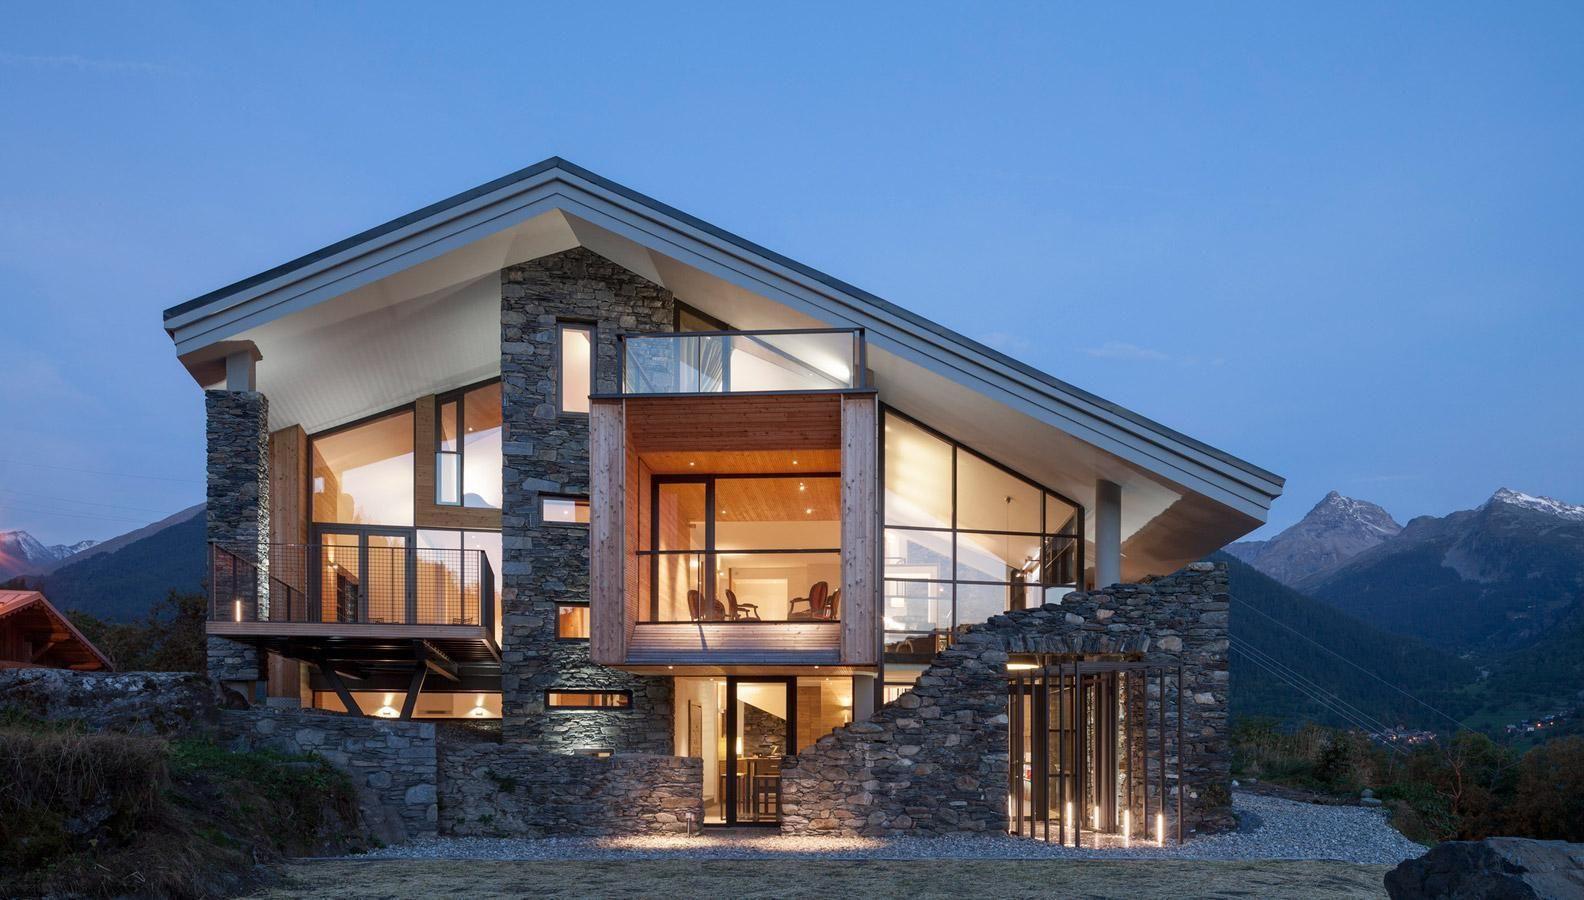 Modern Mountain Home Wallpapers For Phones Arquitetura Arquitetura E Decoracao Decoracao